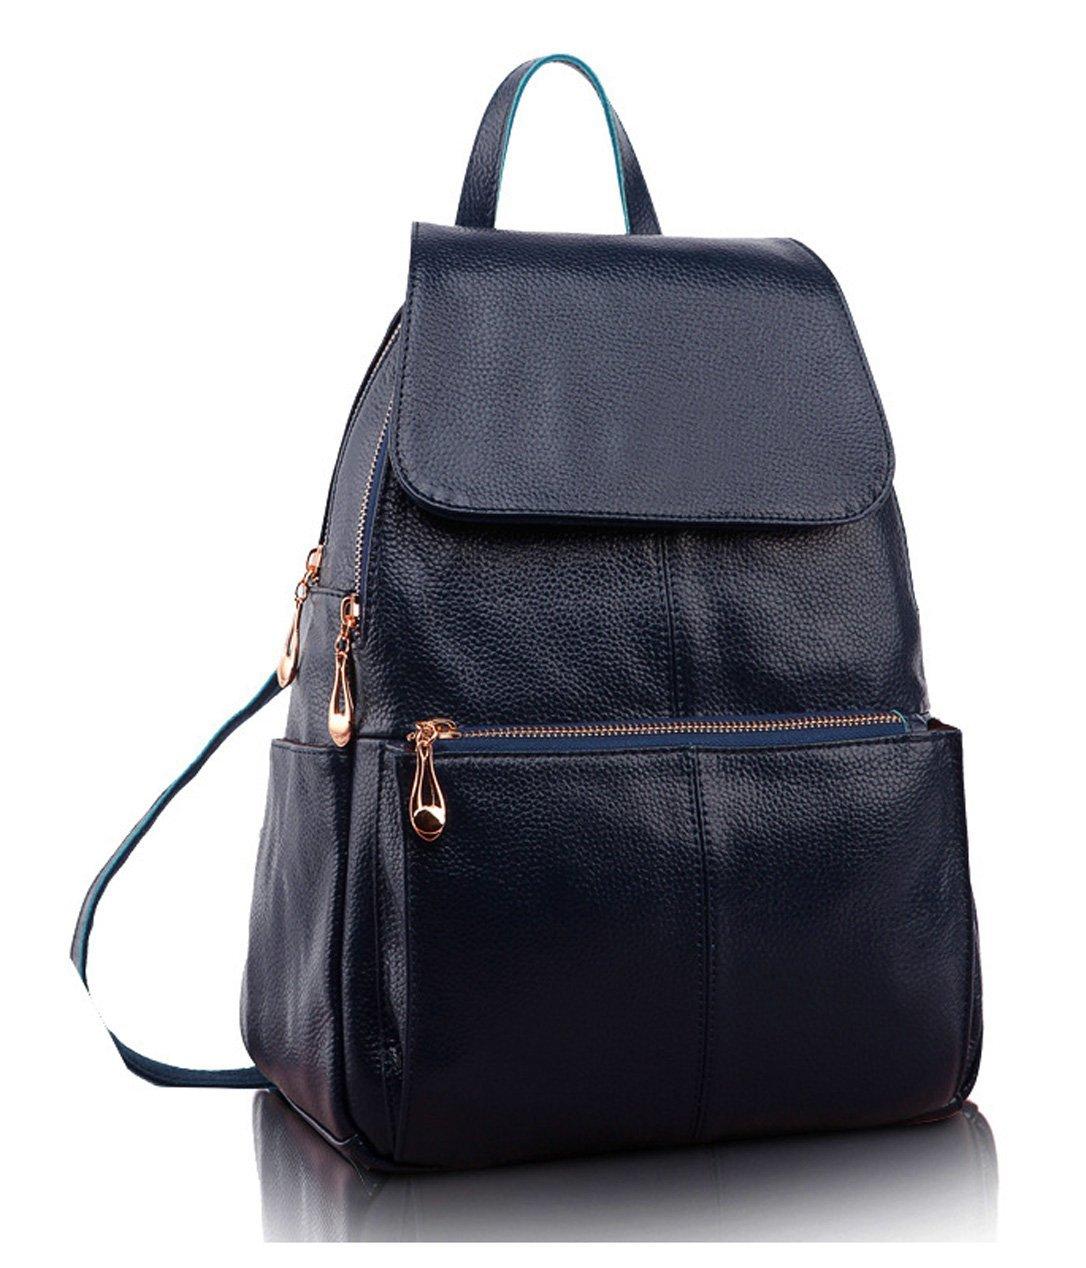 Amazon Damen Echtes Leder Rucksack Vintage Rucksack Damen Mode Schulrucksack Saphir 34,99 Euro 30% Aktion